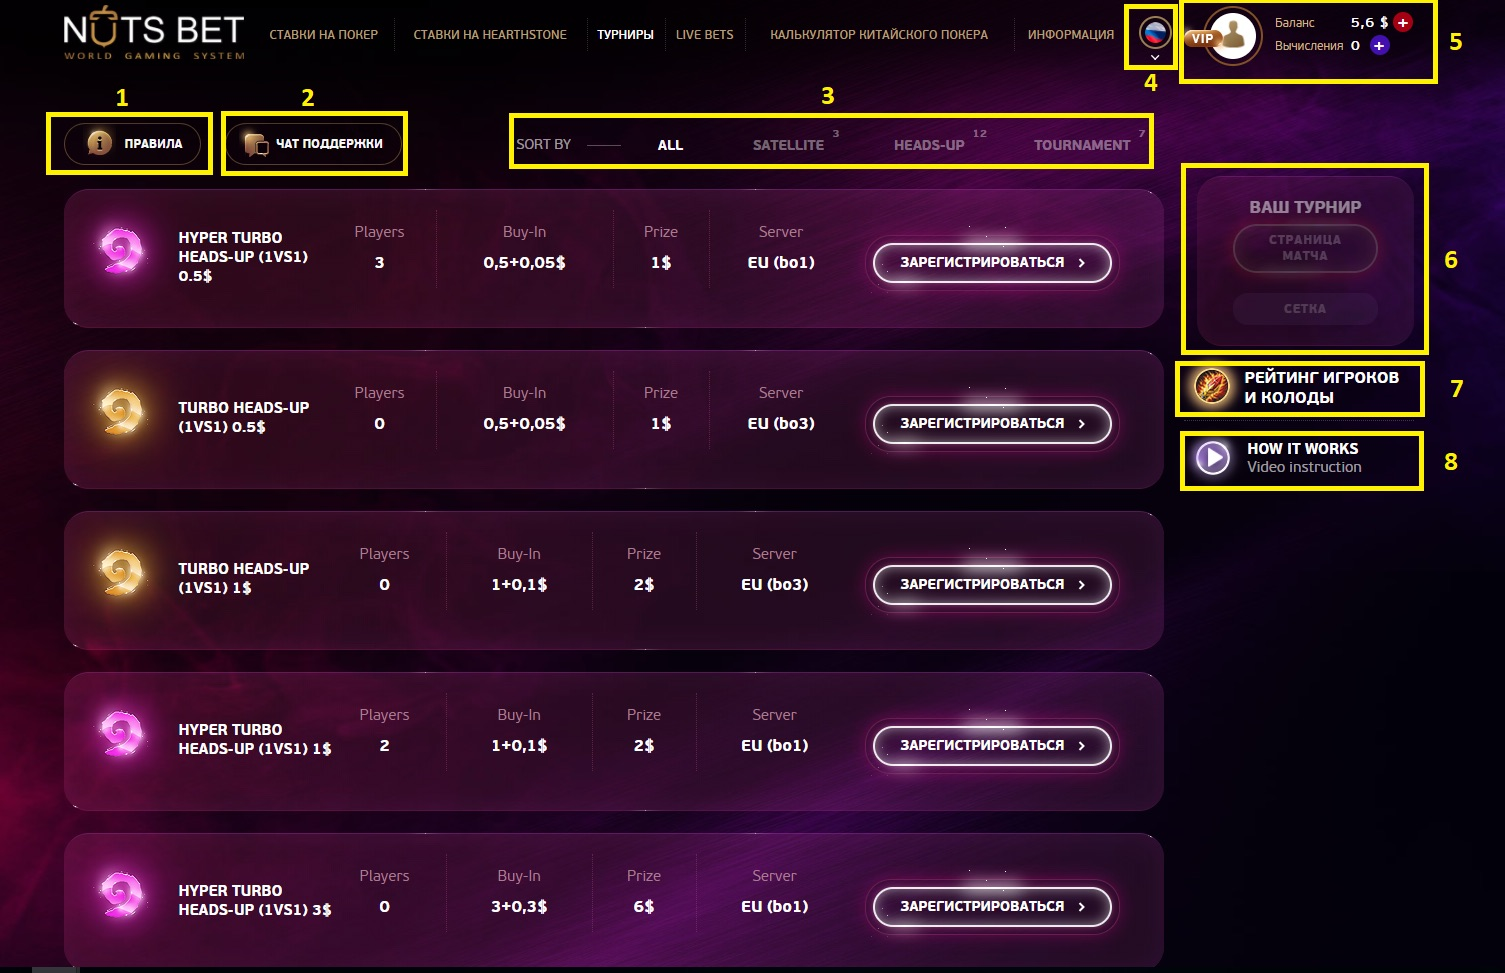 Обзор на турнирную площадку по Hearthstone NutsBet от Privet